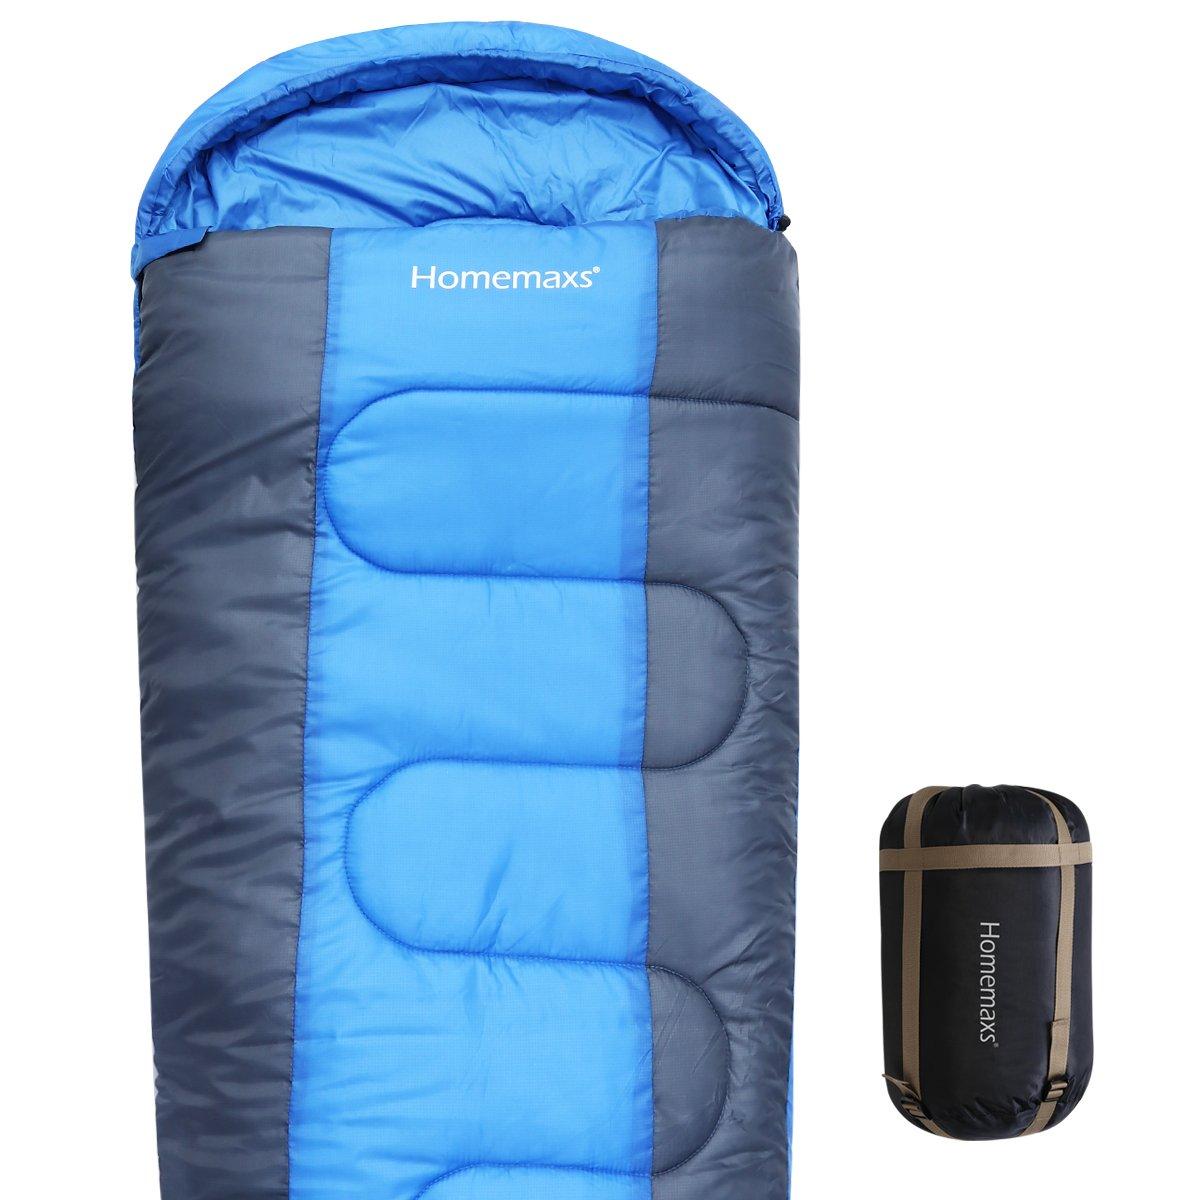 homemaxs Mummy Sleepingバッグ350 GSM軽量3 – 4 Season Sleeping Bag for Adultsキャンプ、ハイキング、バックパッキング、 B071ZGB7ZZ